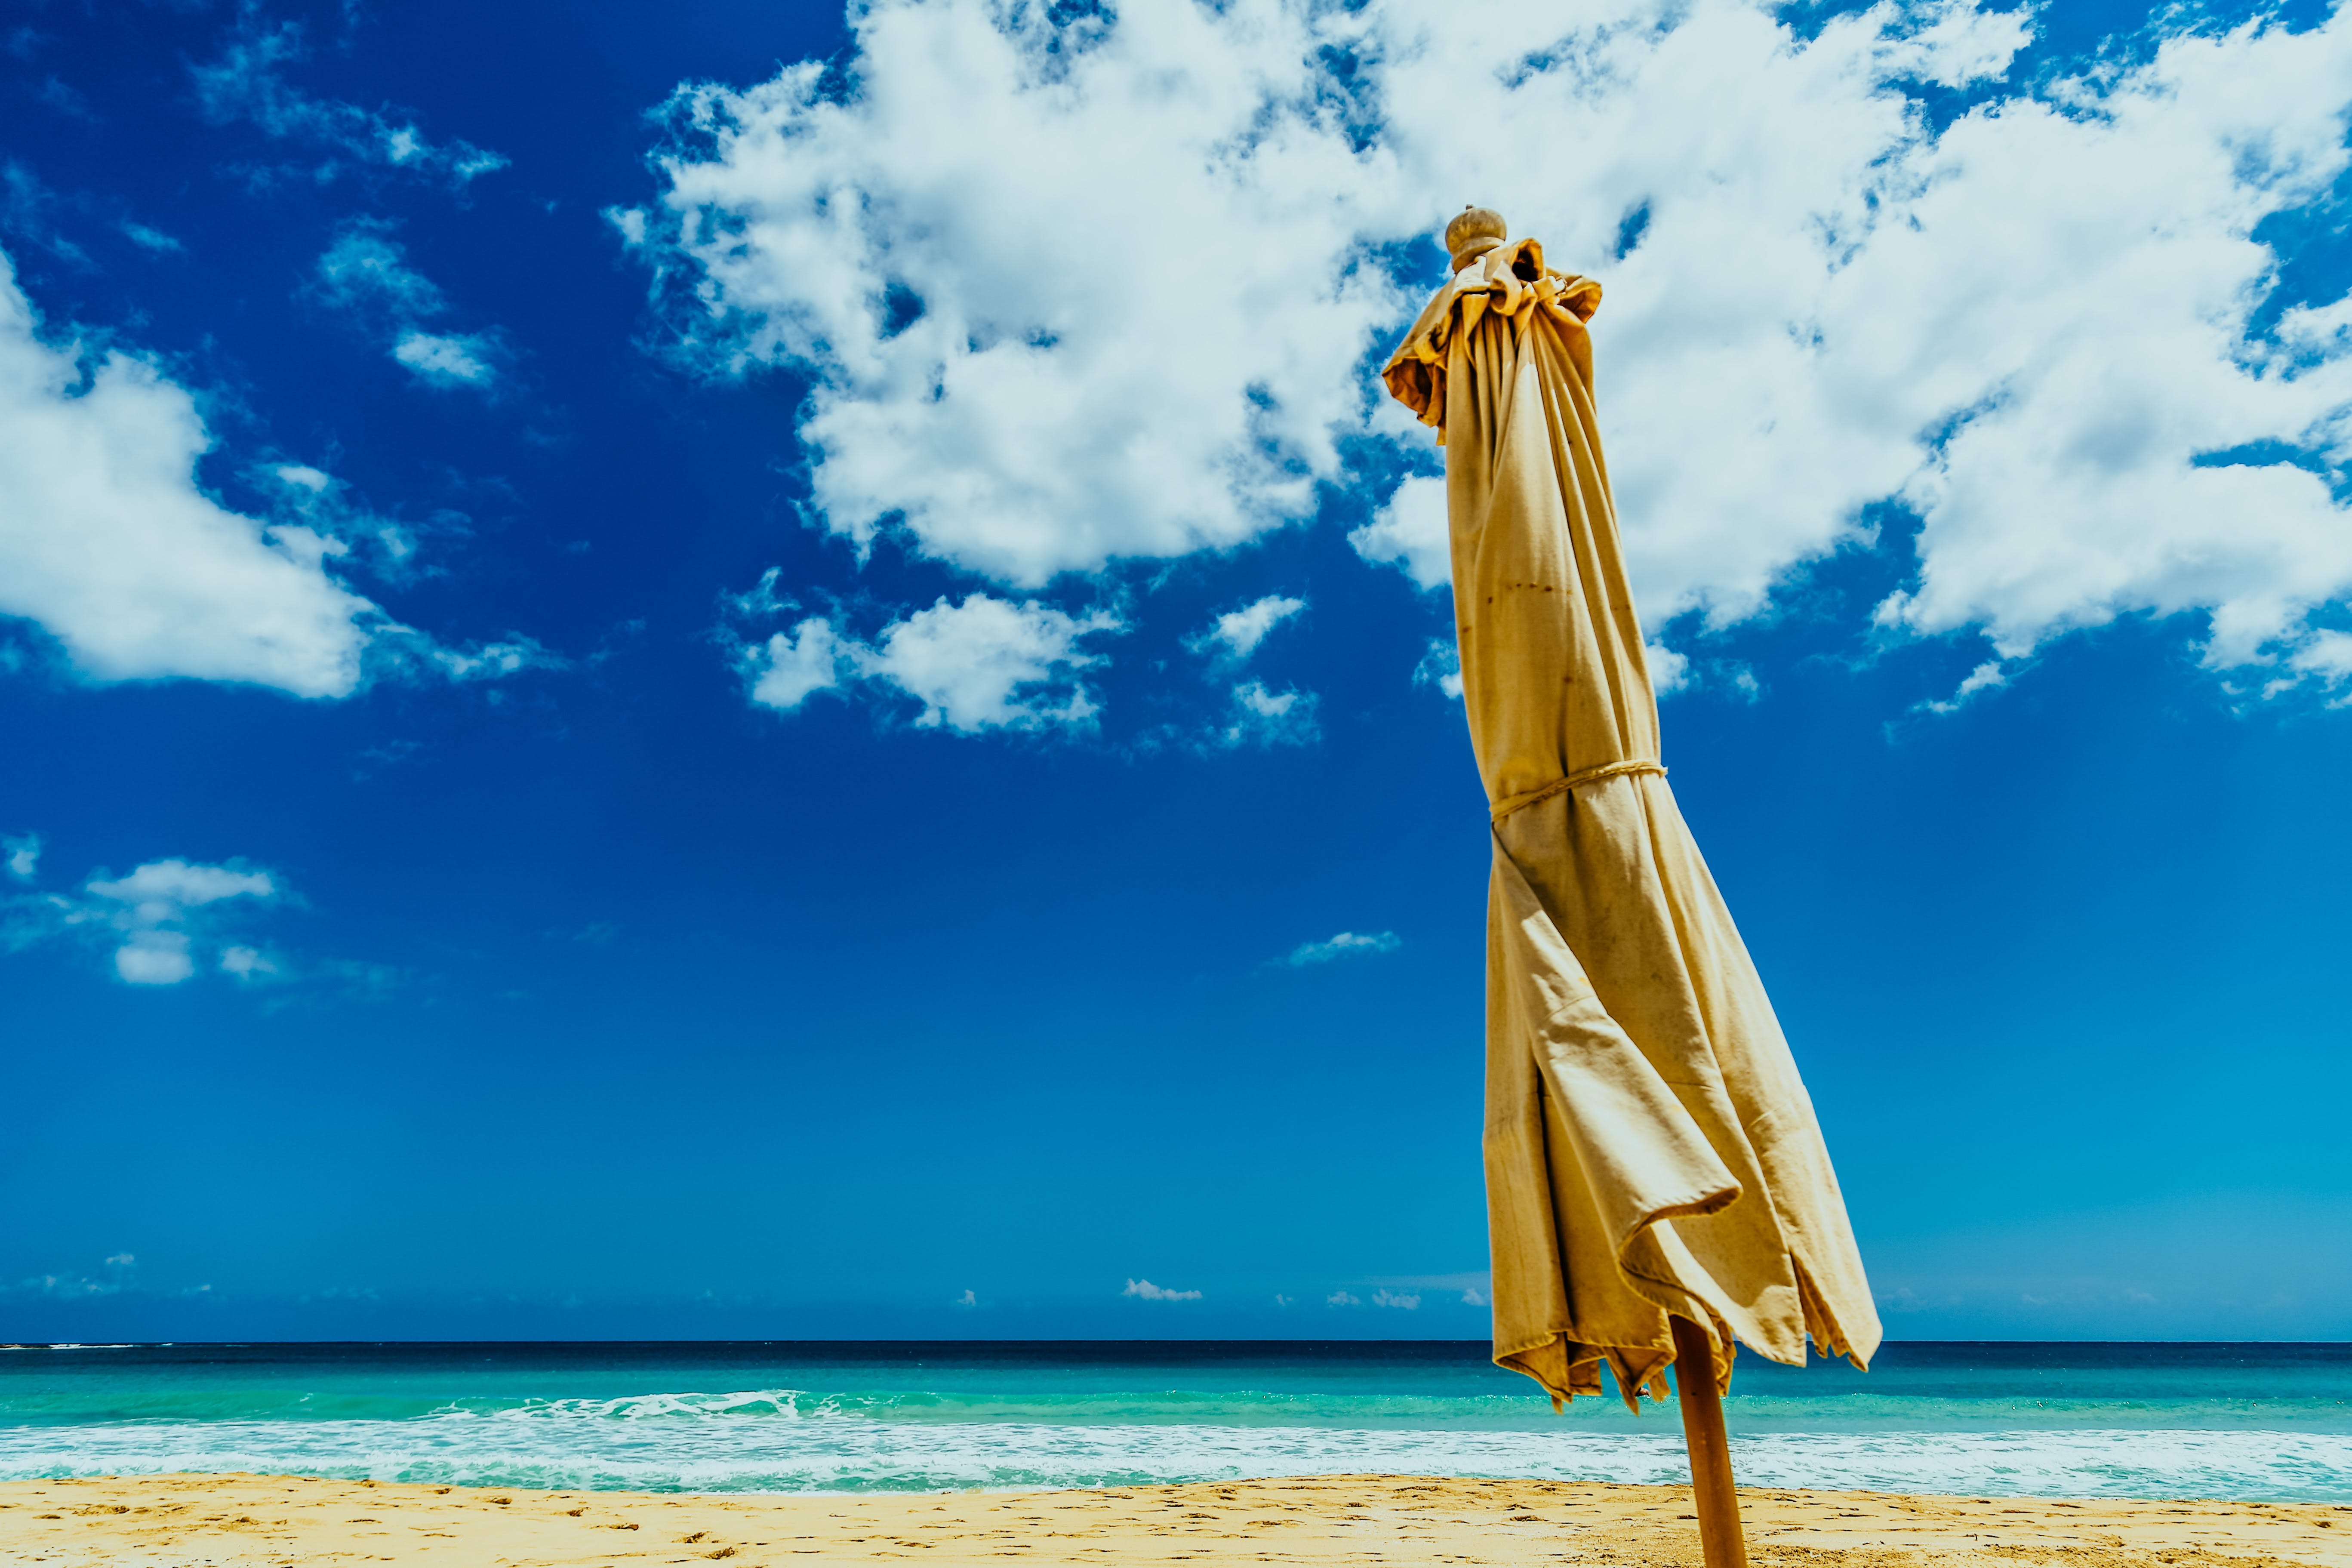 Brown Umbrella on Seashore